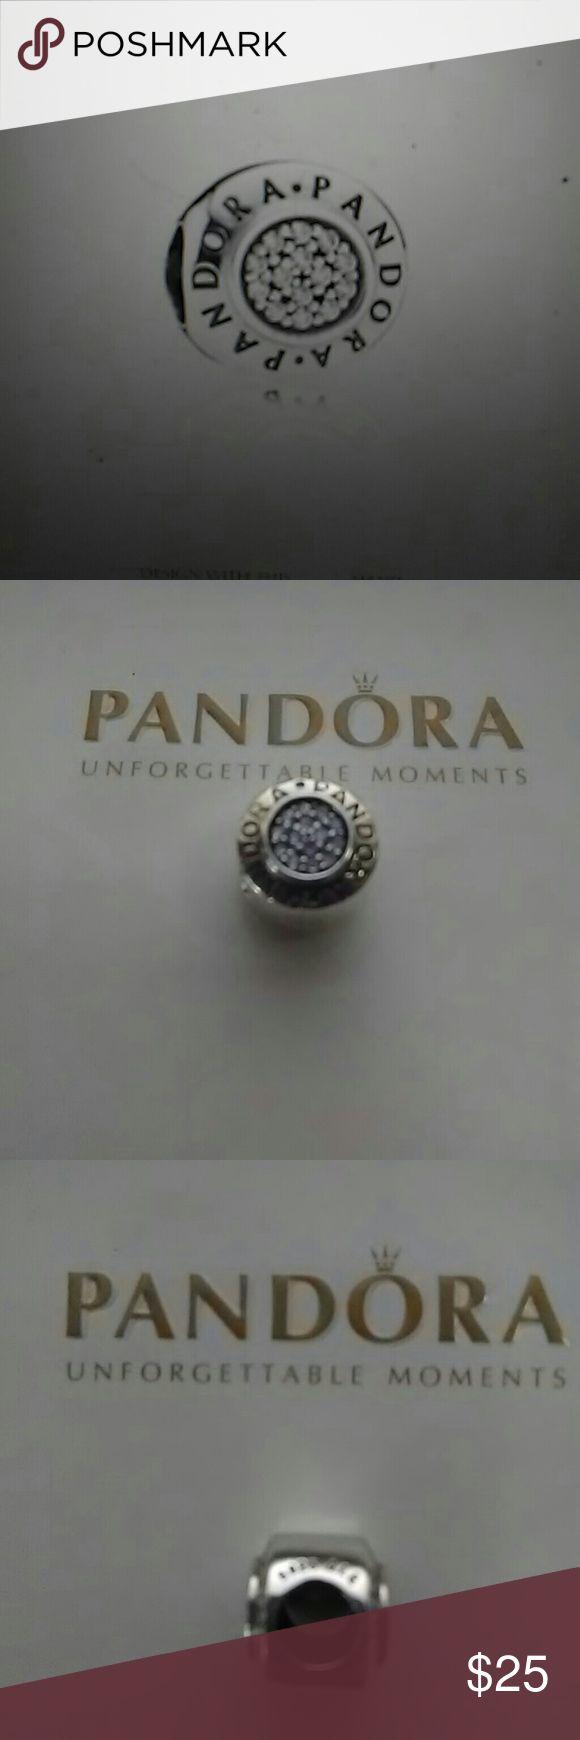 PANDORA SIGNATURE CLEAR CZ Pandora's silver & Cz signature charm.                        Item # 791414CZ PANDORA Jewelry